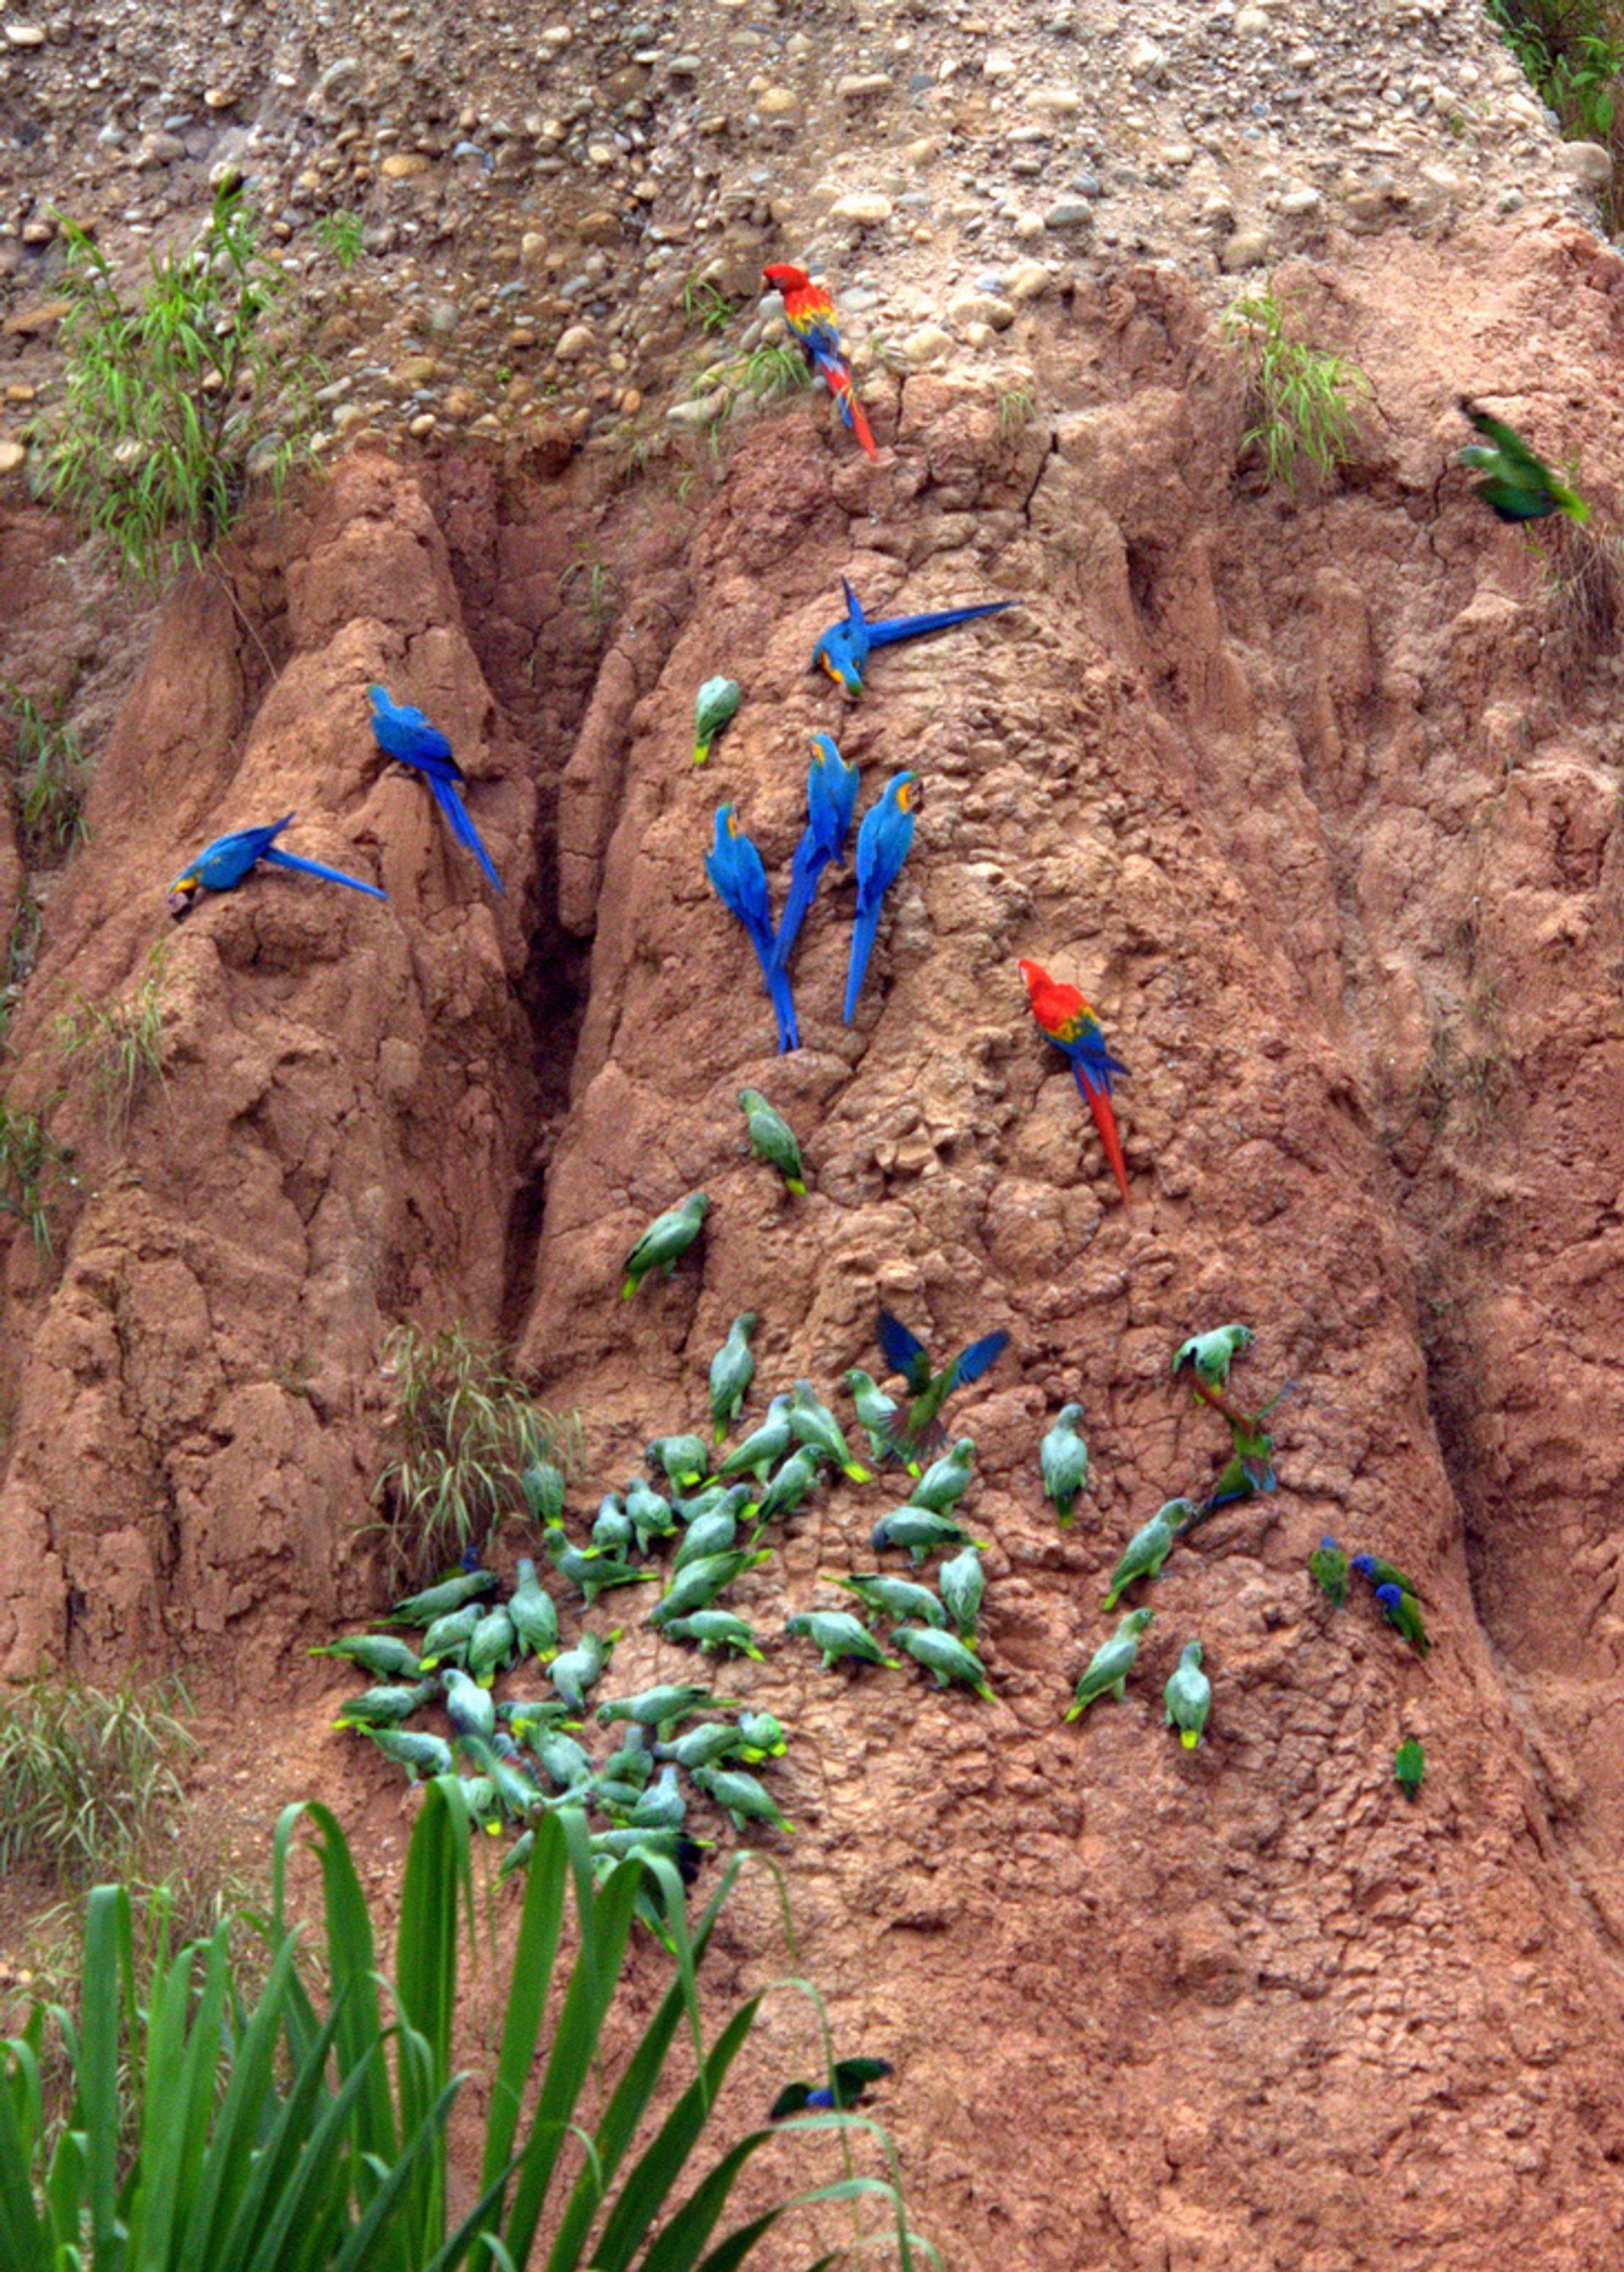 Macaw Clay Lick in Machu Picchu and Cusco - Best Season 2019